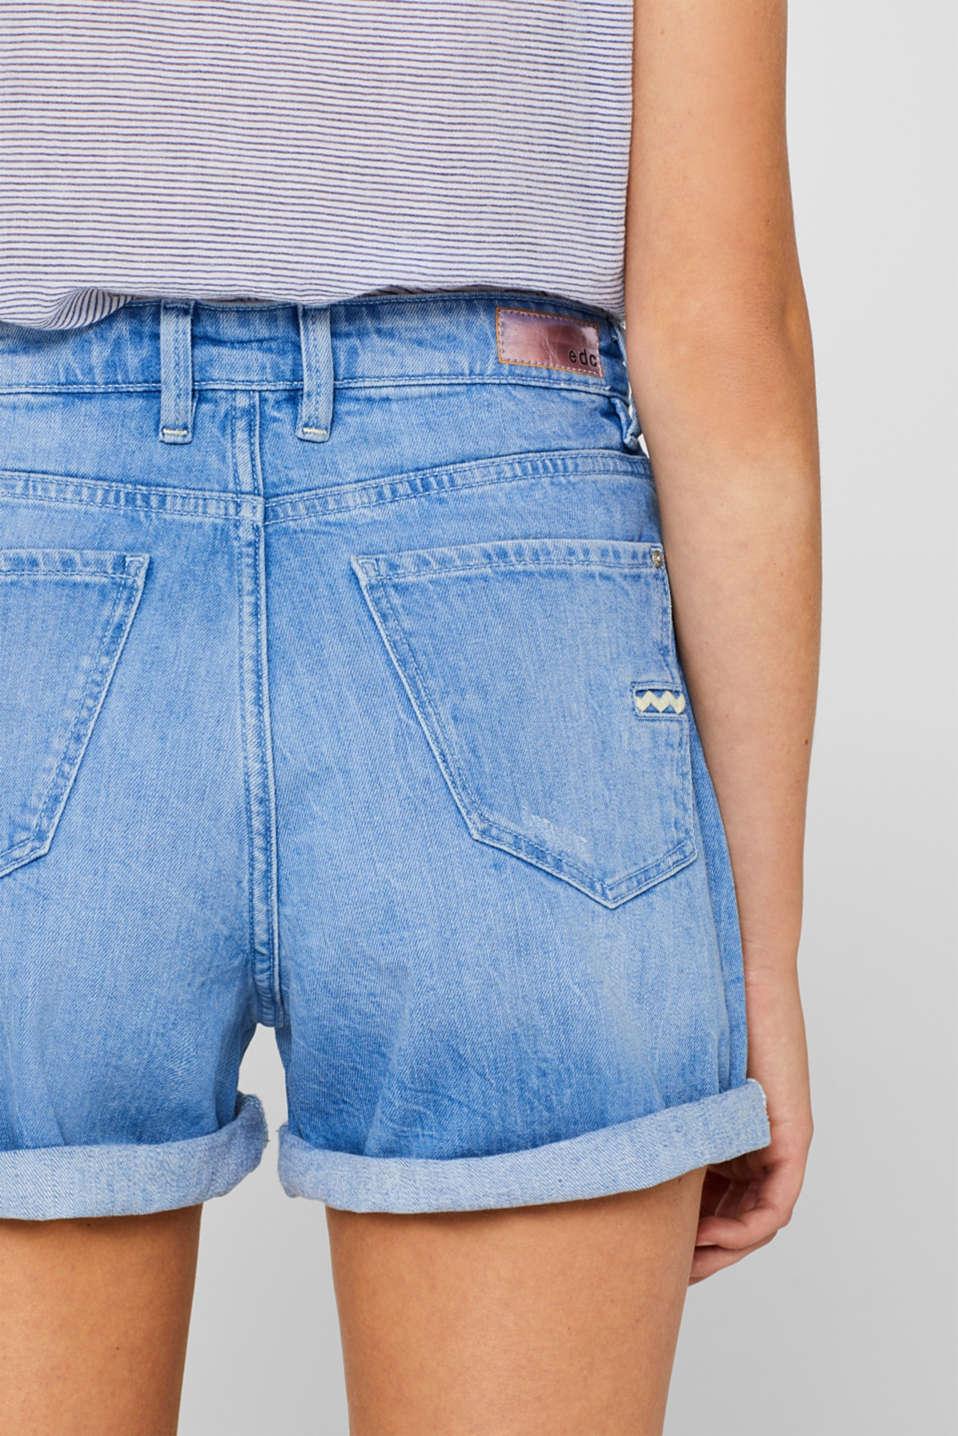 Stretch denim shorts with zigzag stitching, BLUE LIGHT WASH, detail image number 5